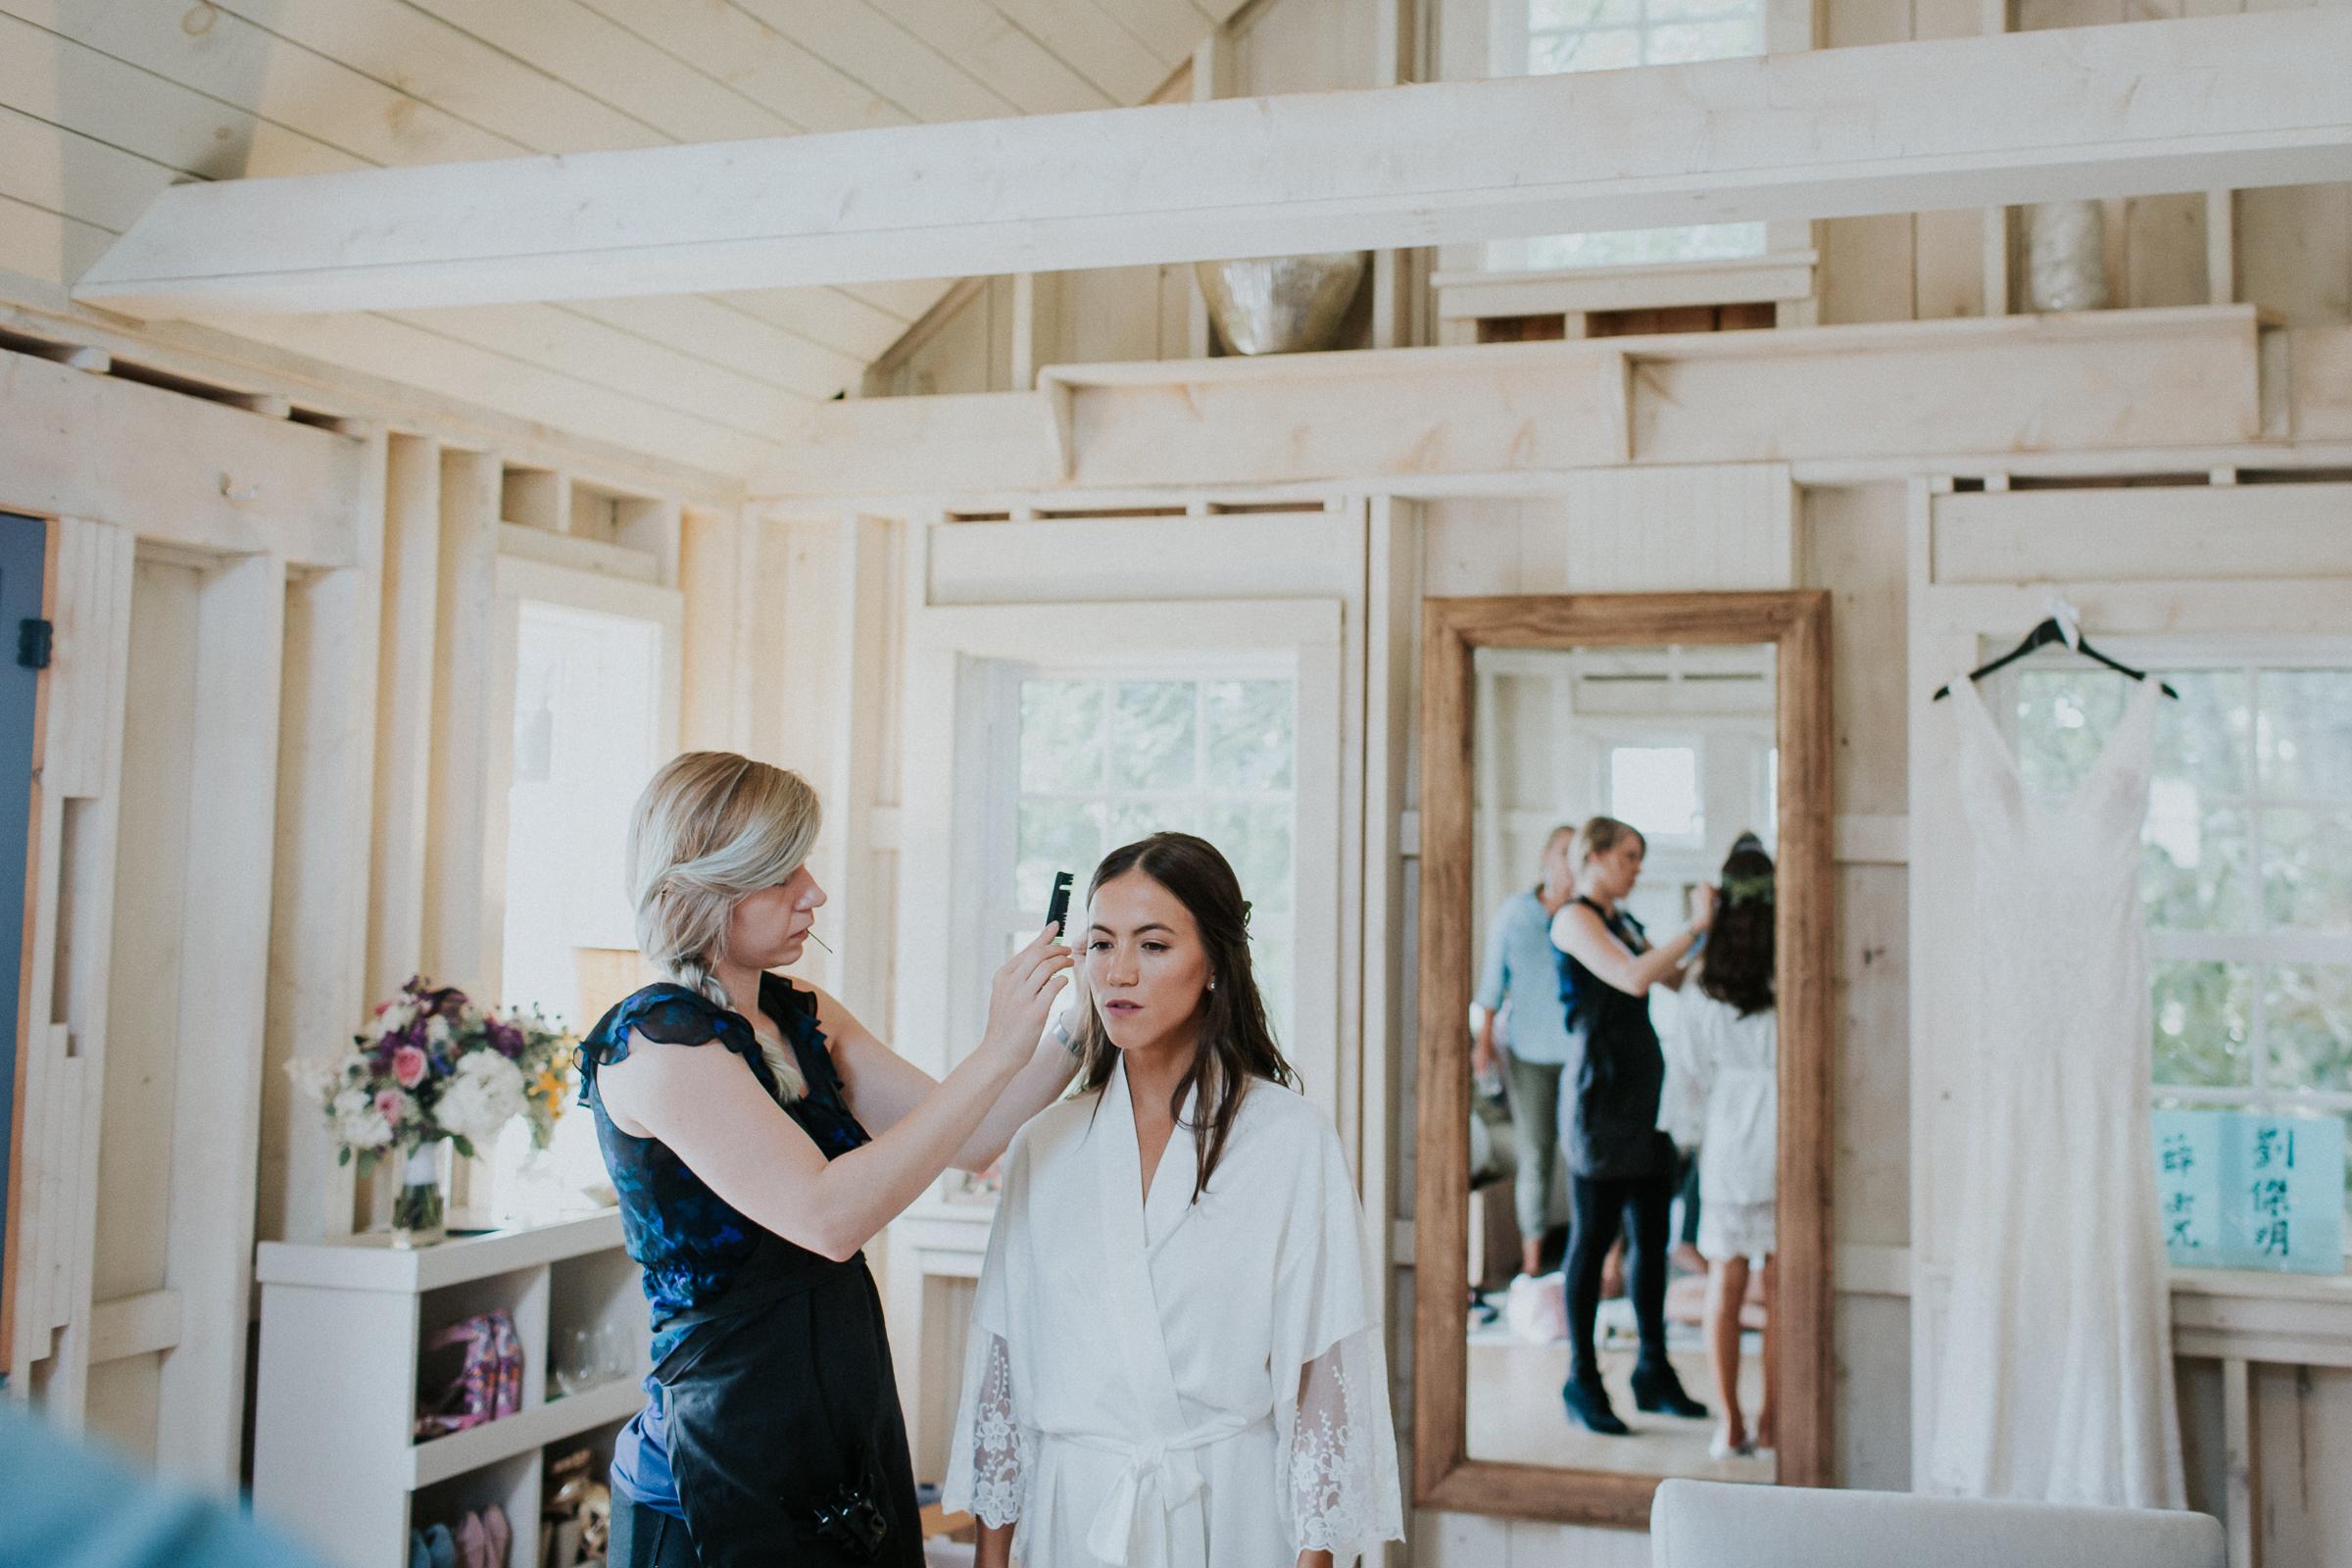 Marianmade-Farm-Wiscasset-Maine-Fine-Art-Documentary-Wedding-Photographer-Elvira-Kalviste-Photography-12.jpg